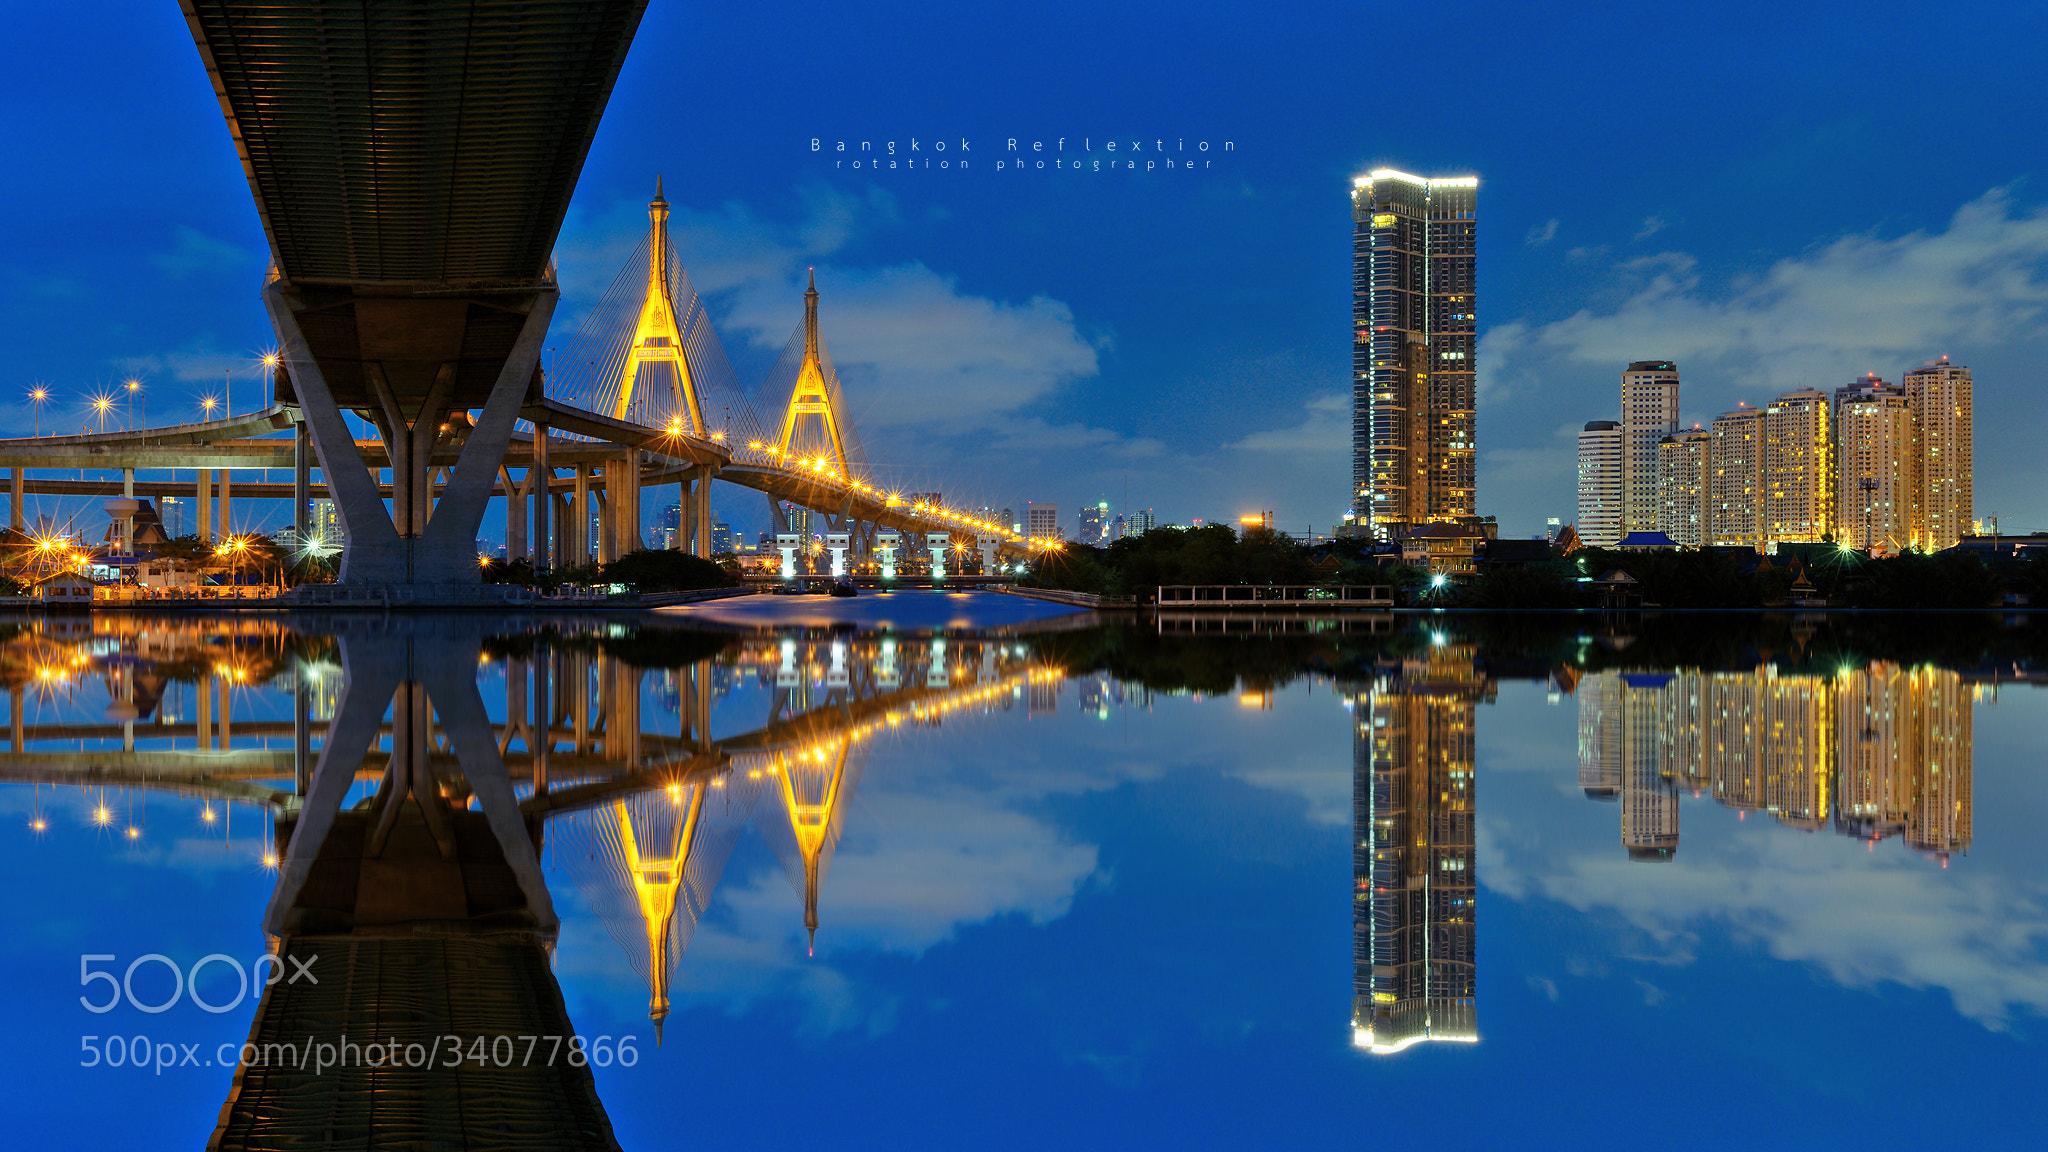 Photograph Bangkok Reflextion by Jirawas Teekayu on 500px